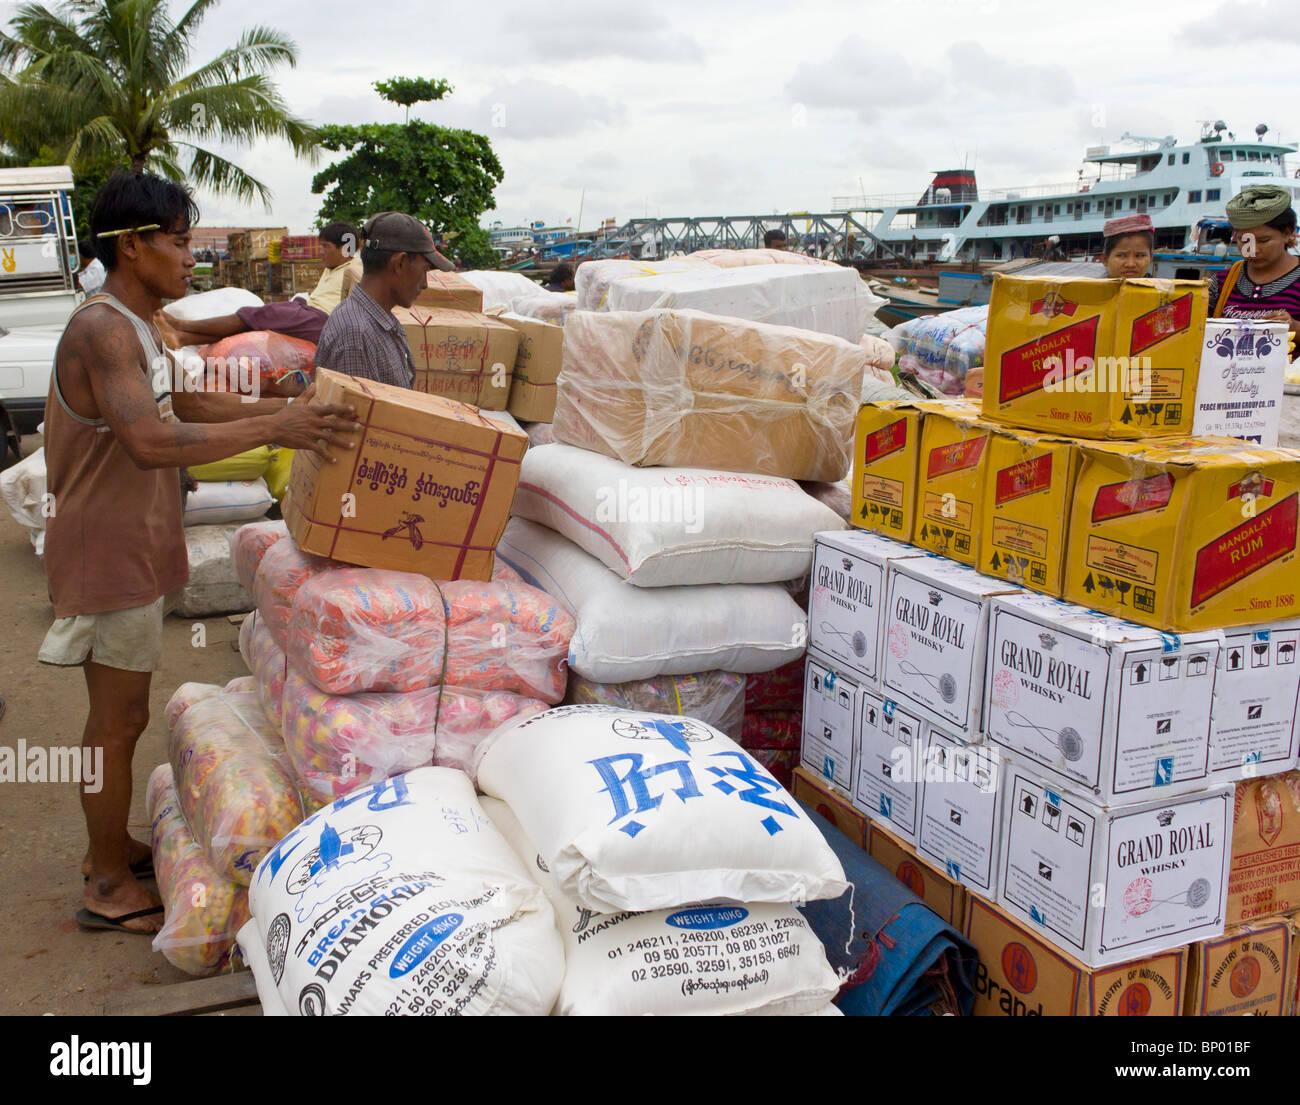 manual labourer stacking boxes, Yangon docks, Myanmar - Stock Image